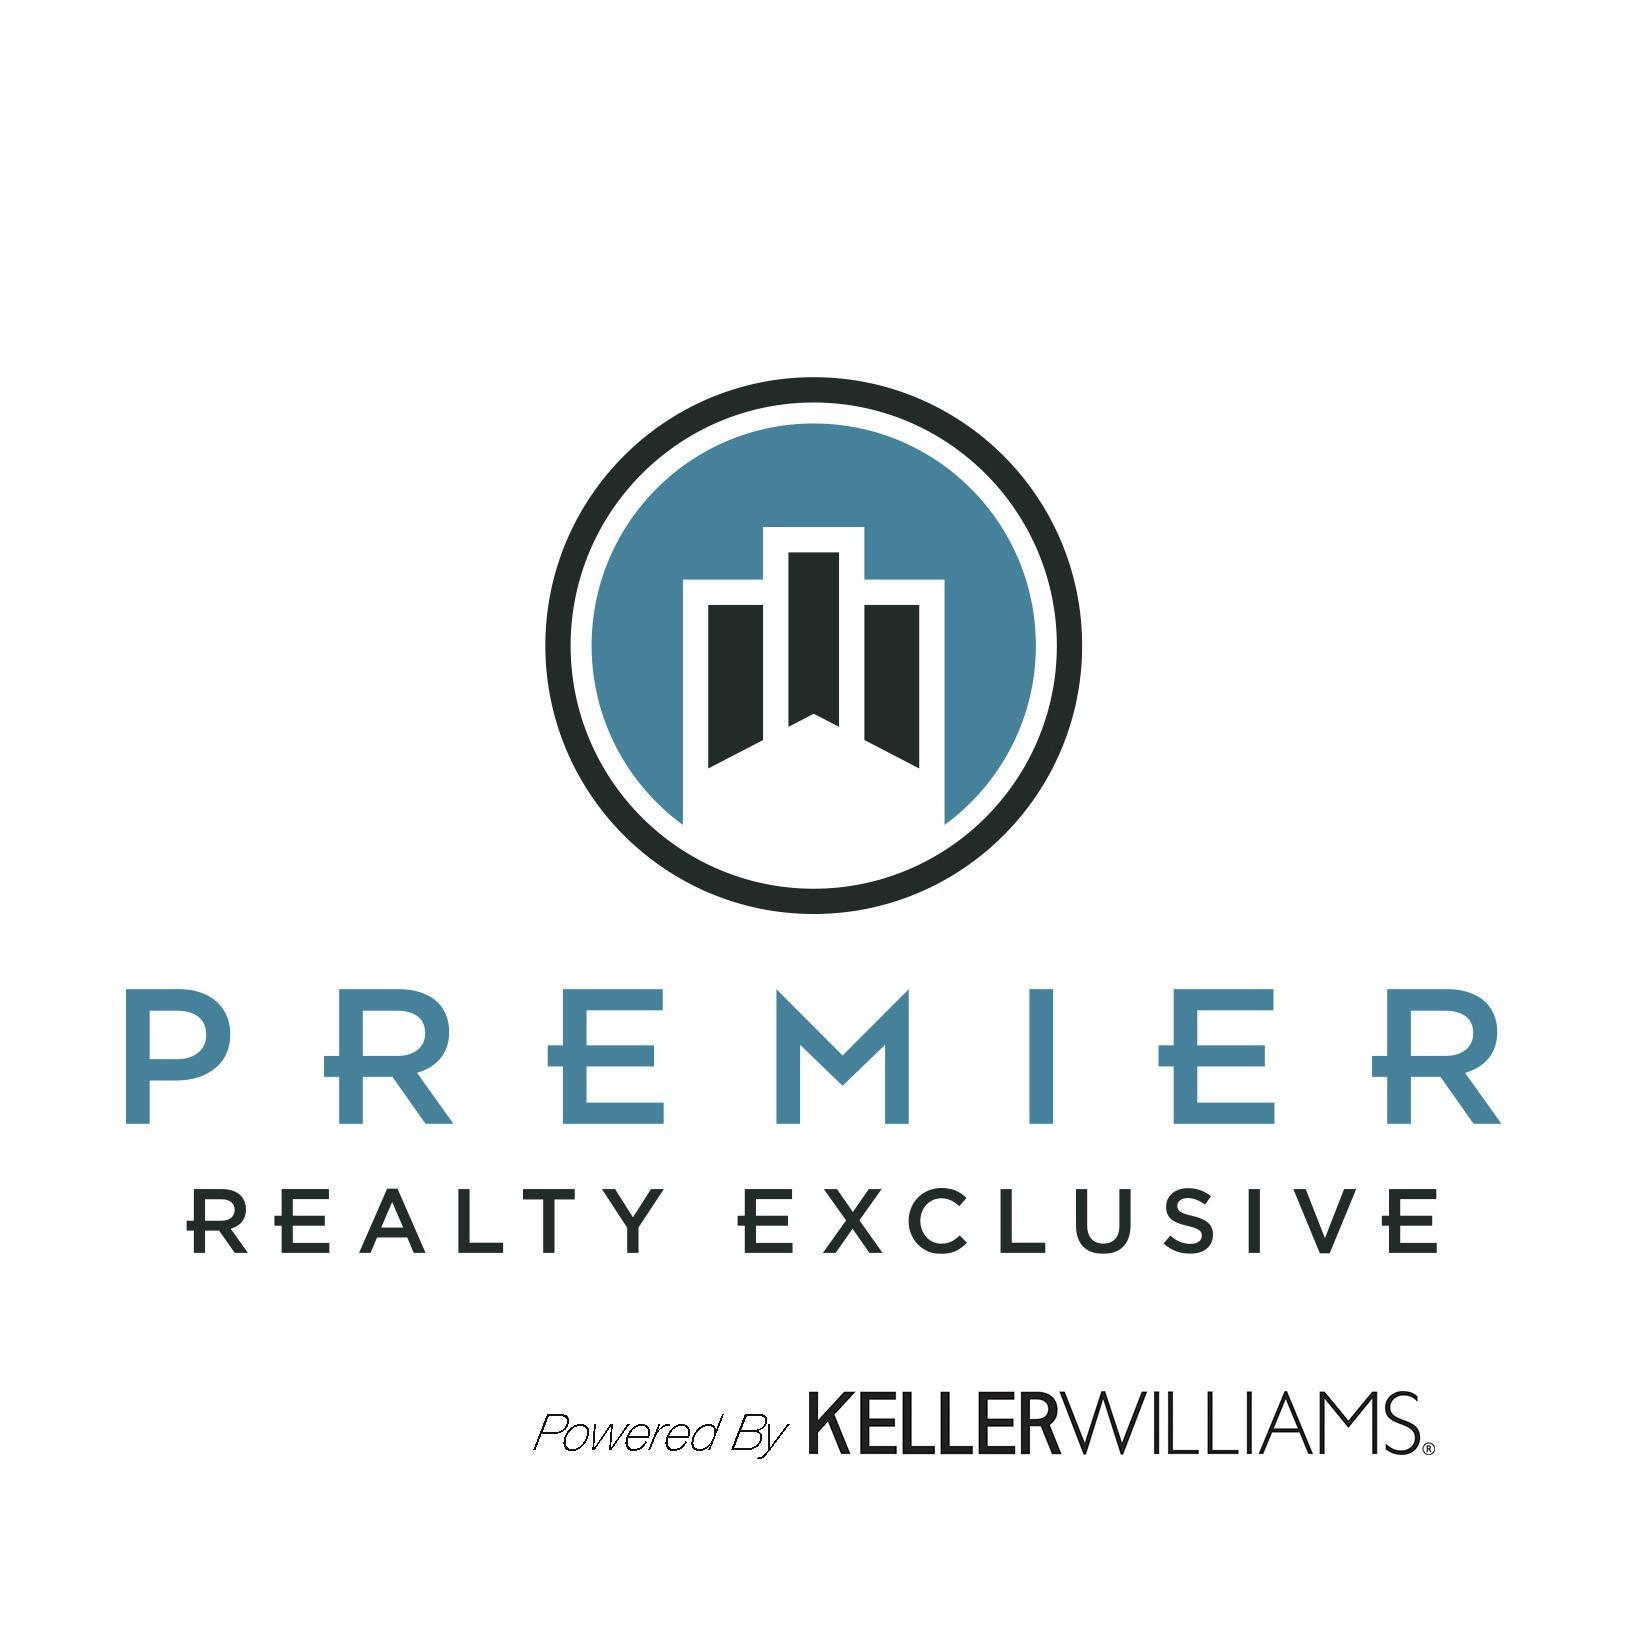 Premier Realty Exclusive